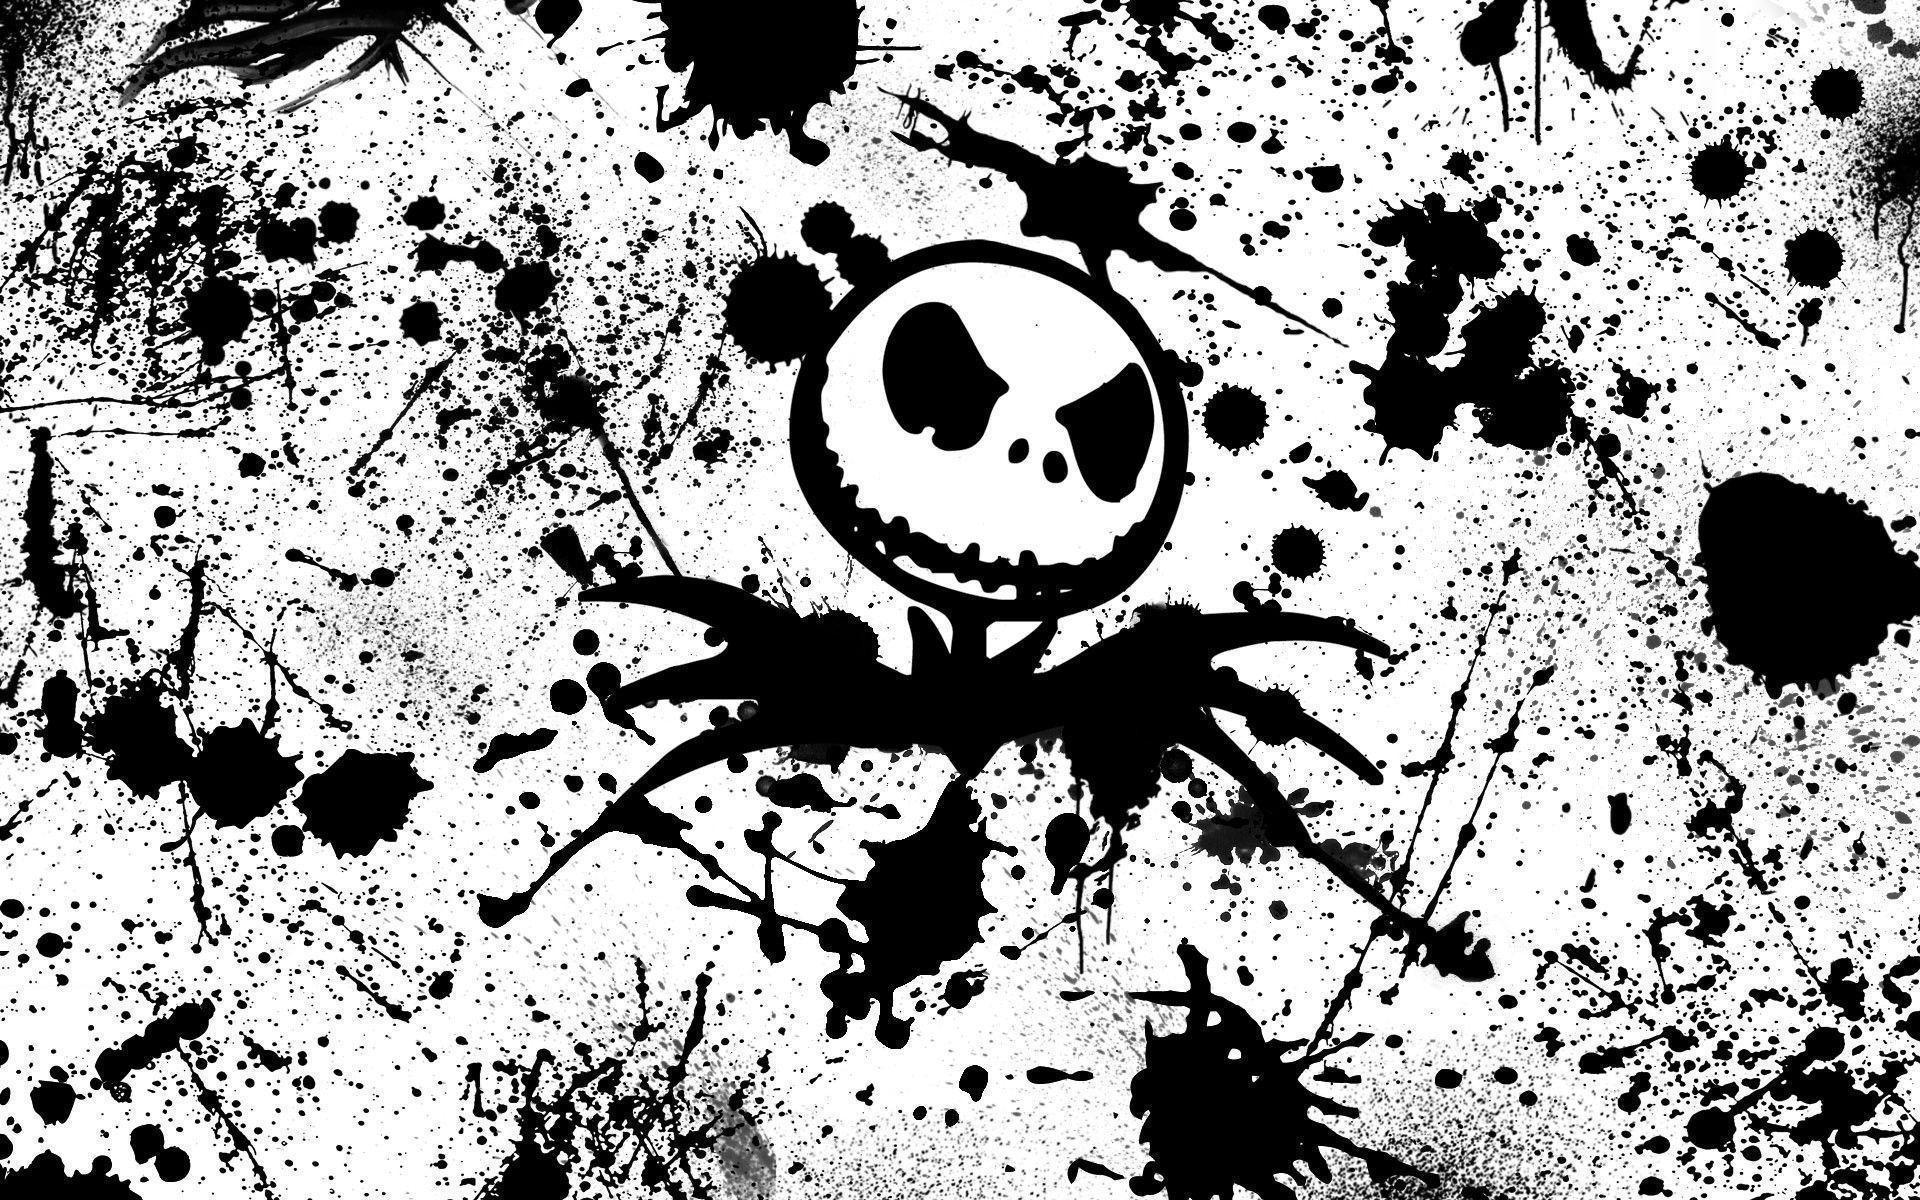 Wallpapers For > Jack Skellington Halloween Wallpaper